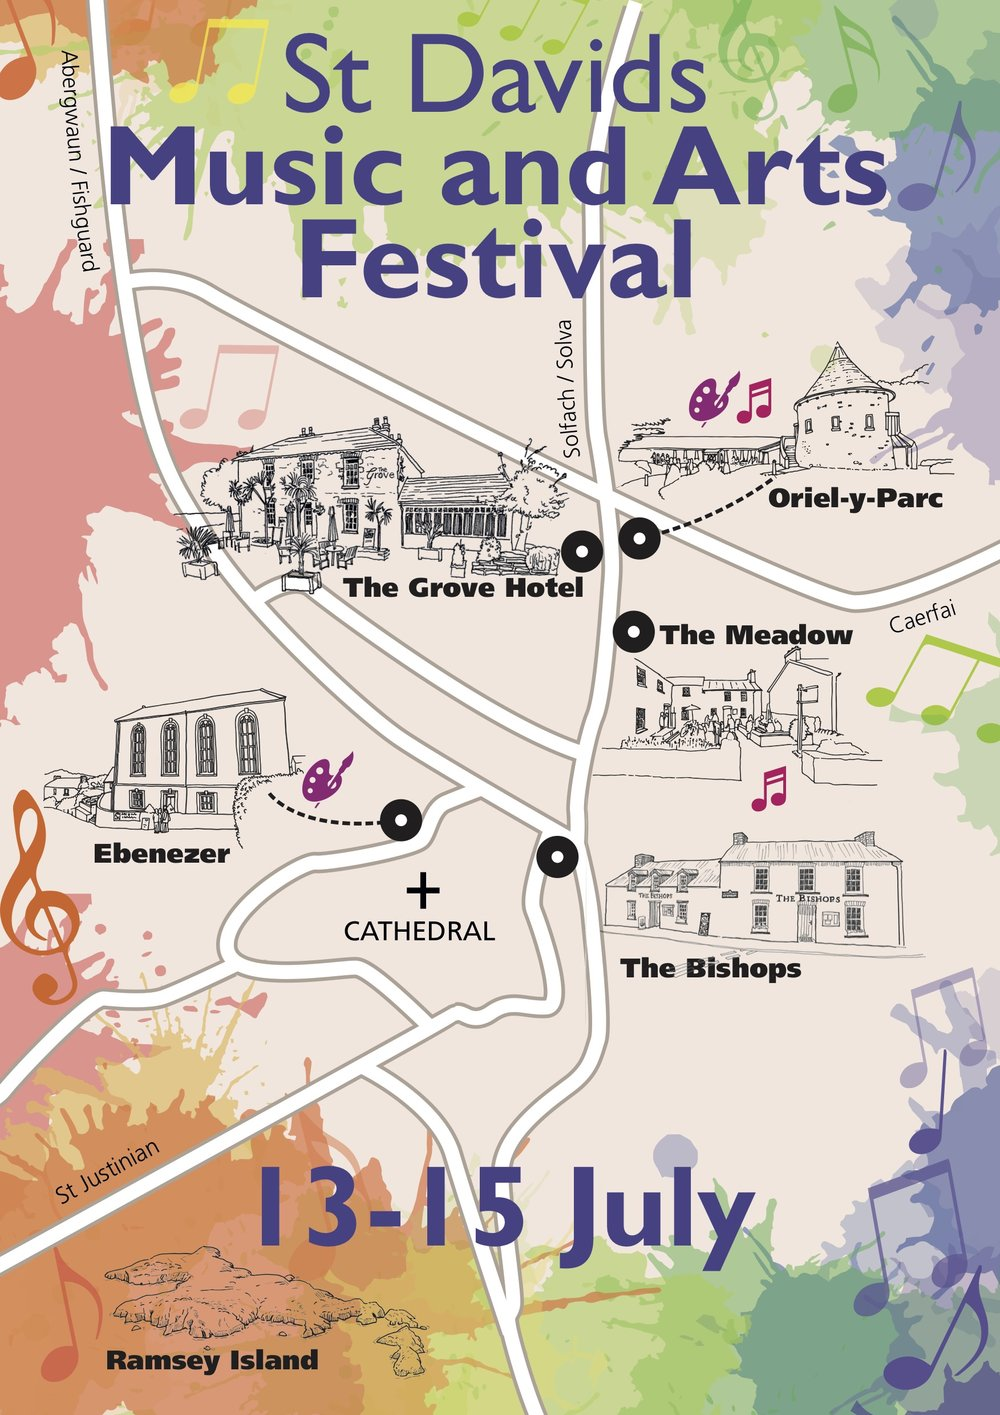 st_davids_music-arts_festival_poster_2018 copy.jpg